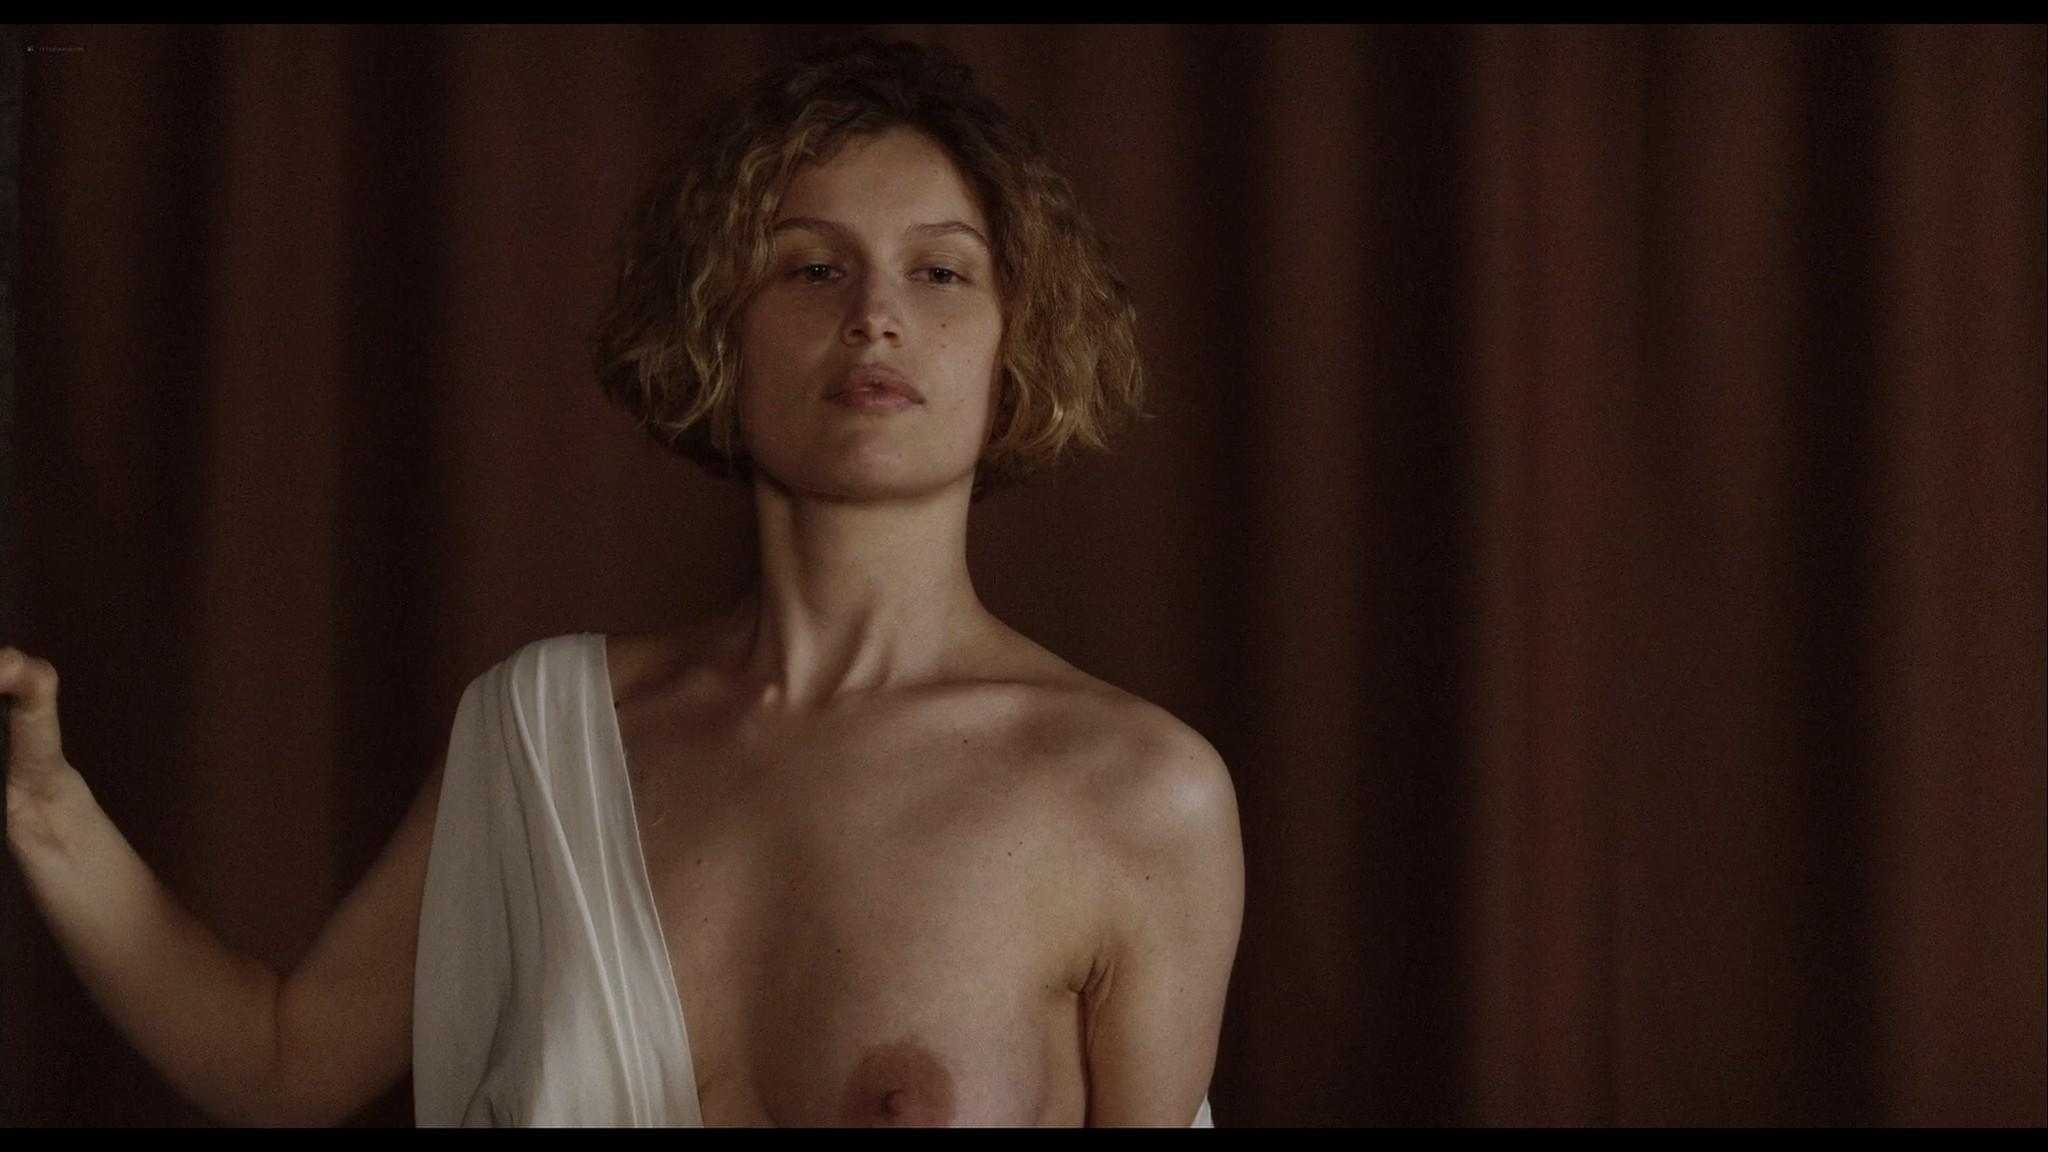 Laetitia Casta nude topless and very hot La jeune fille et les loups 2007 HD 1080p BluRay 4